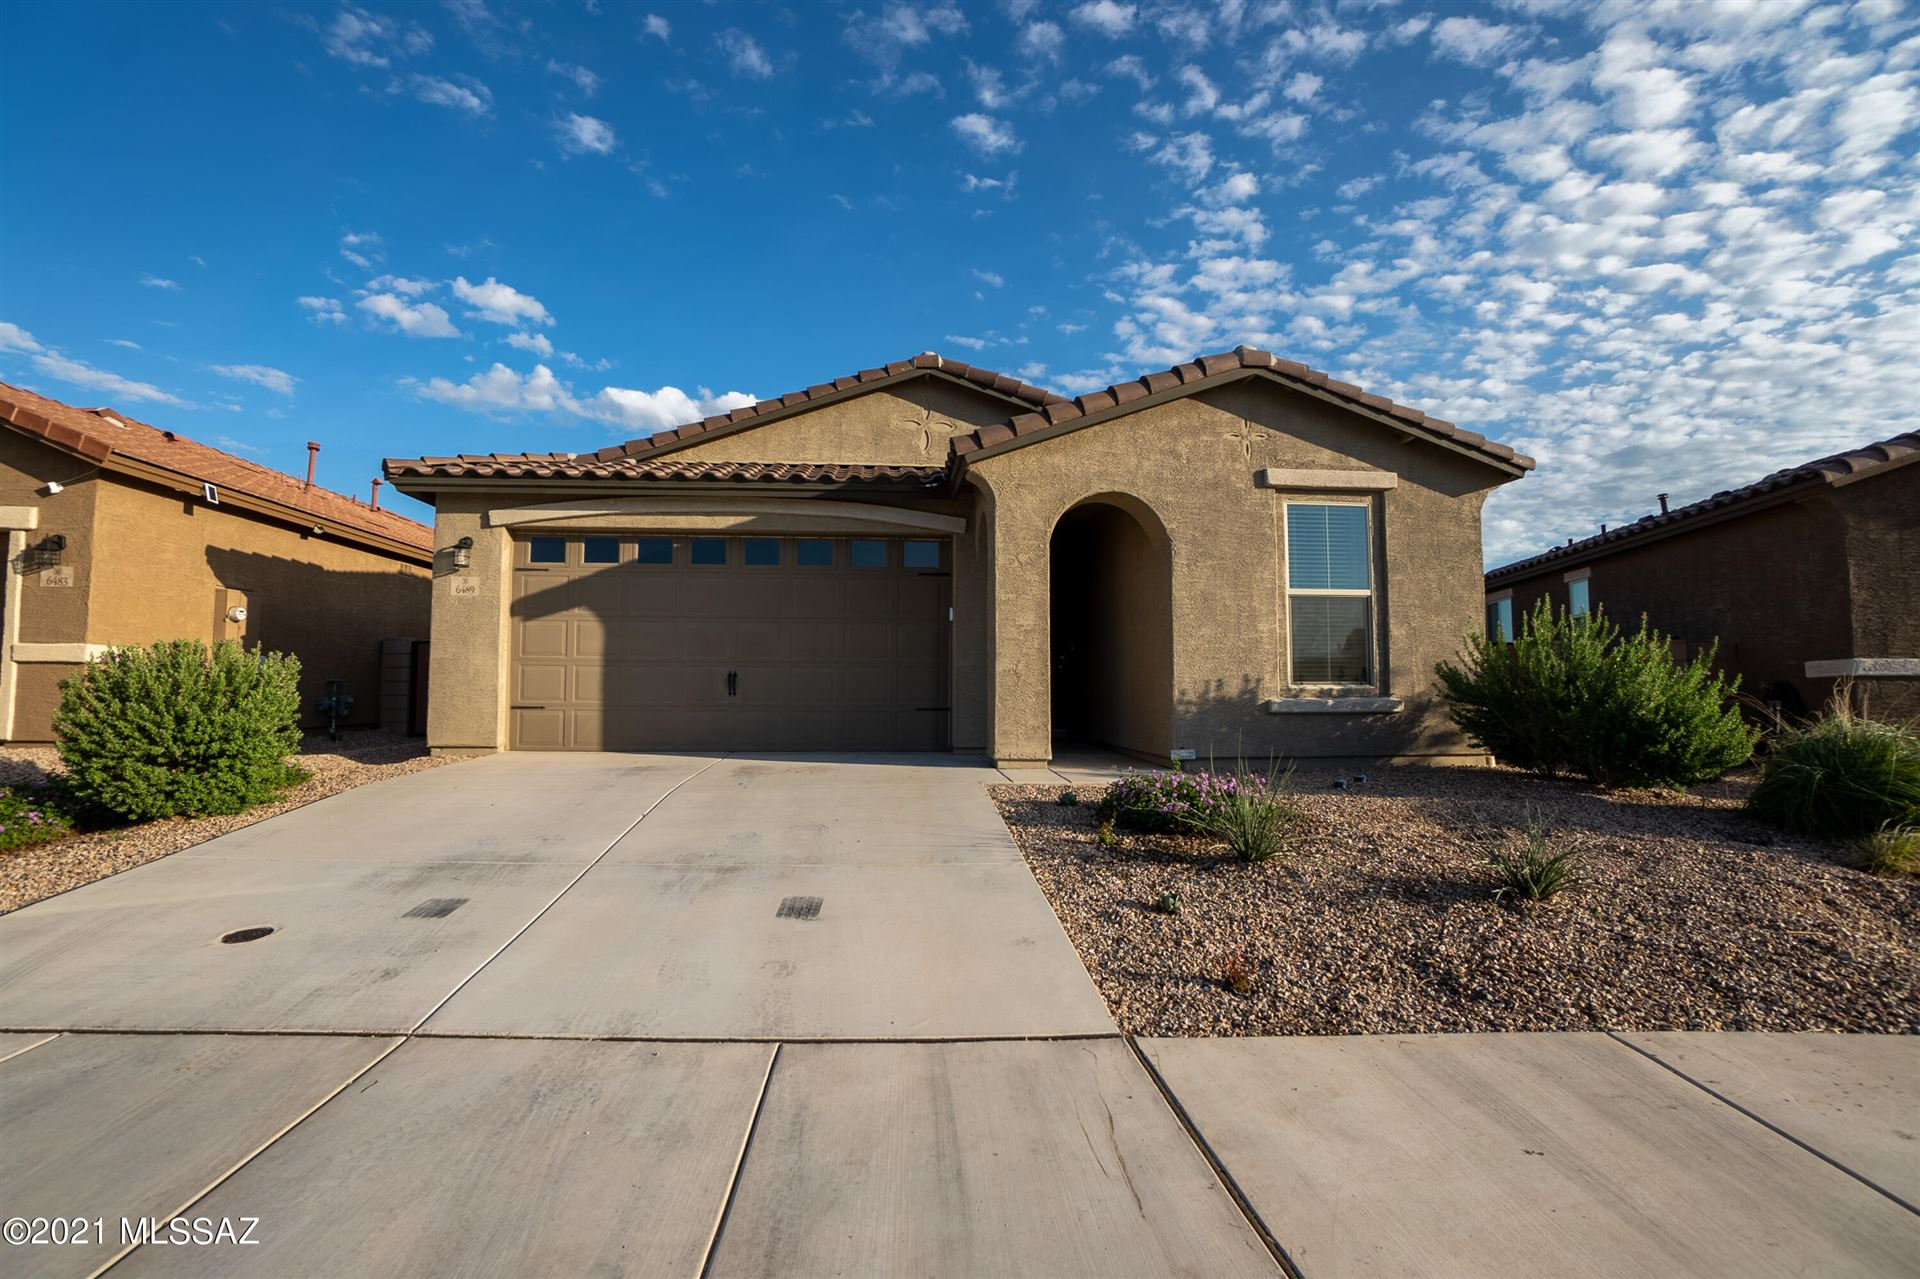 6489 E Via Arroyo Largo, Tucson, AZ 85756 - MLS#: 22120059